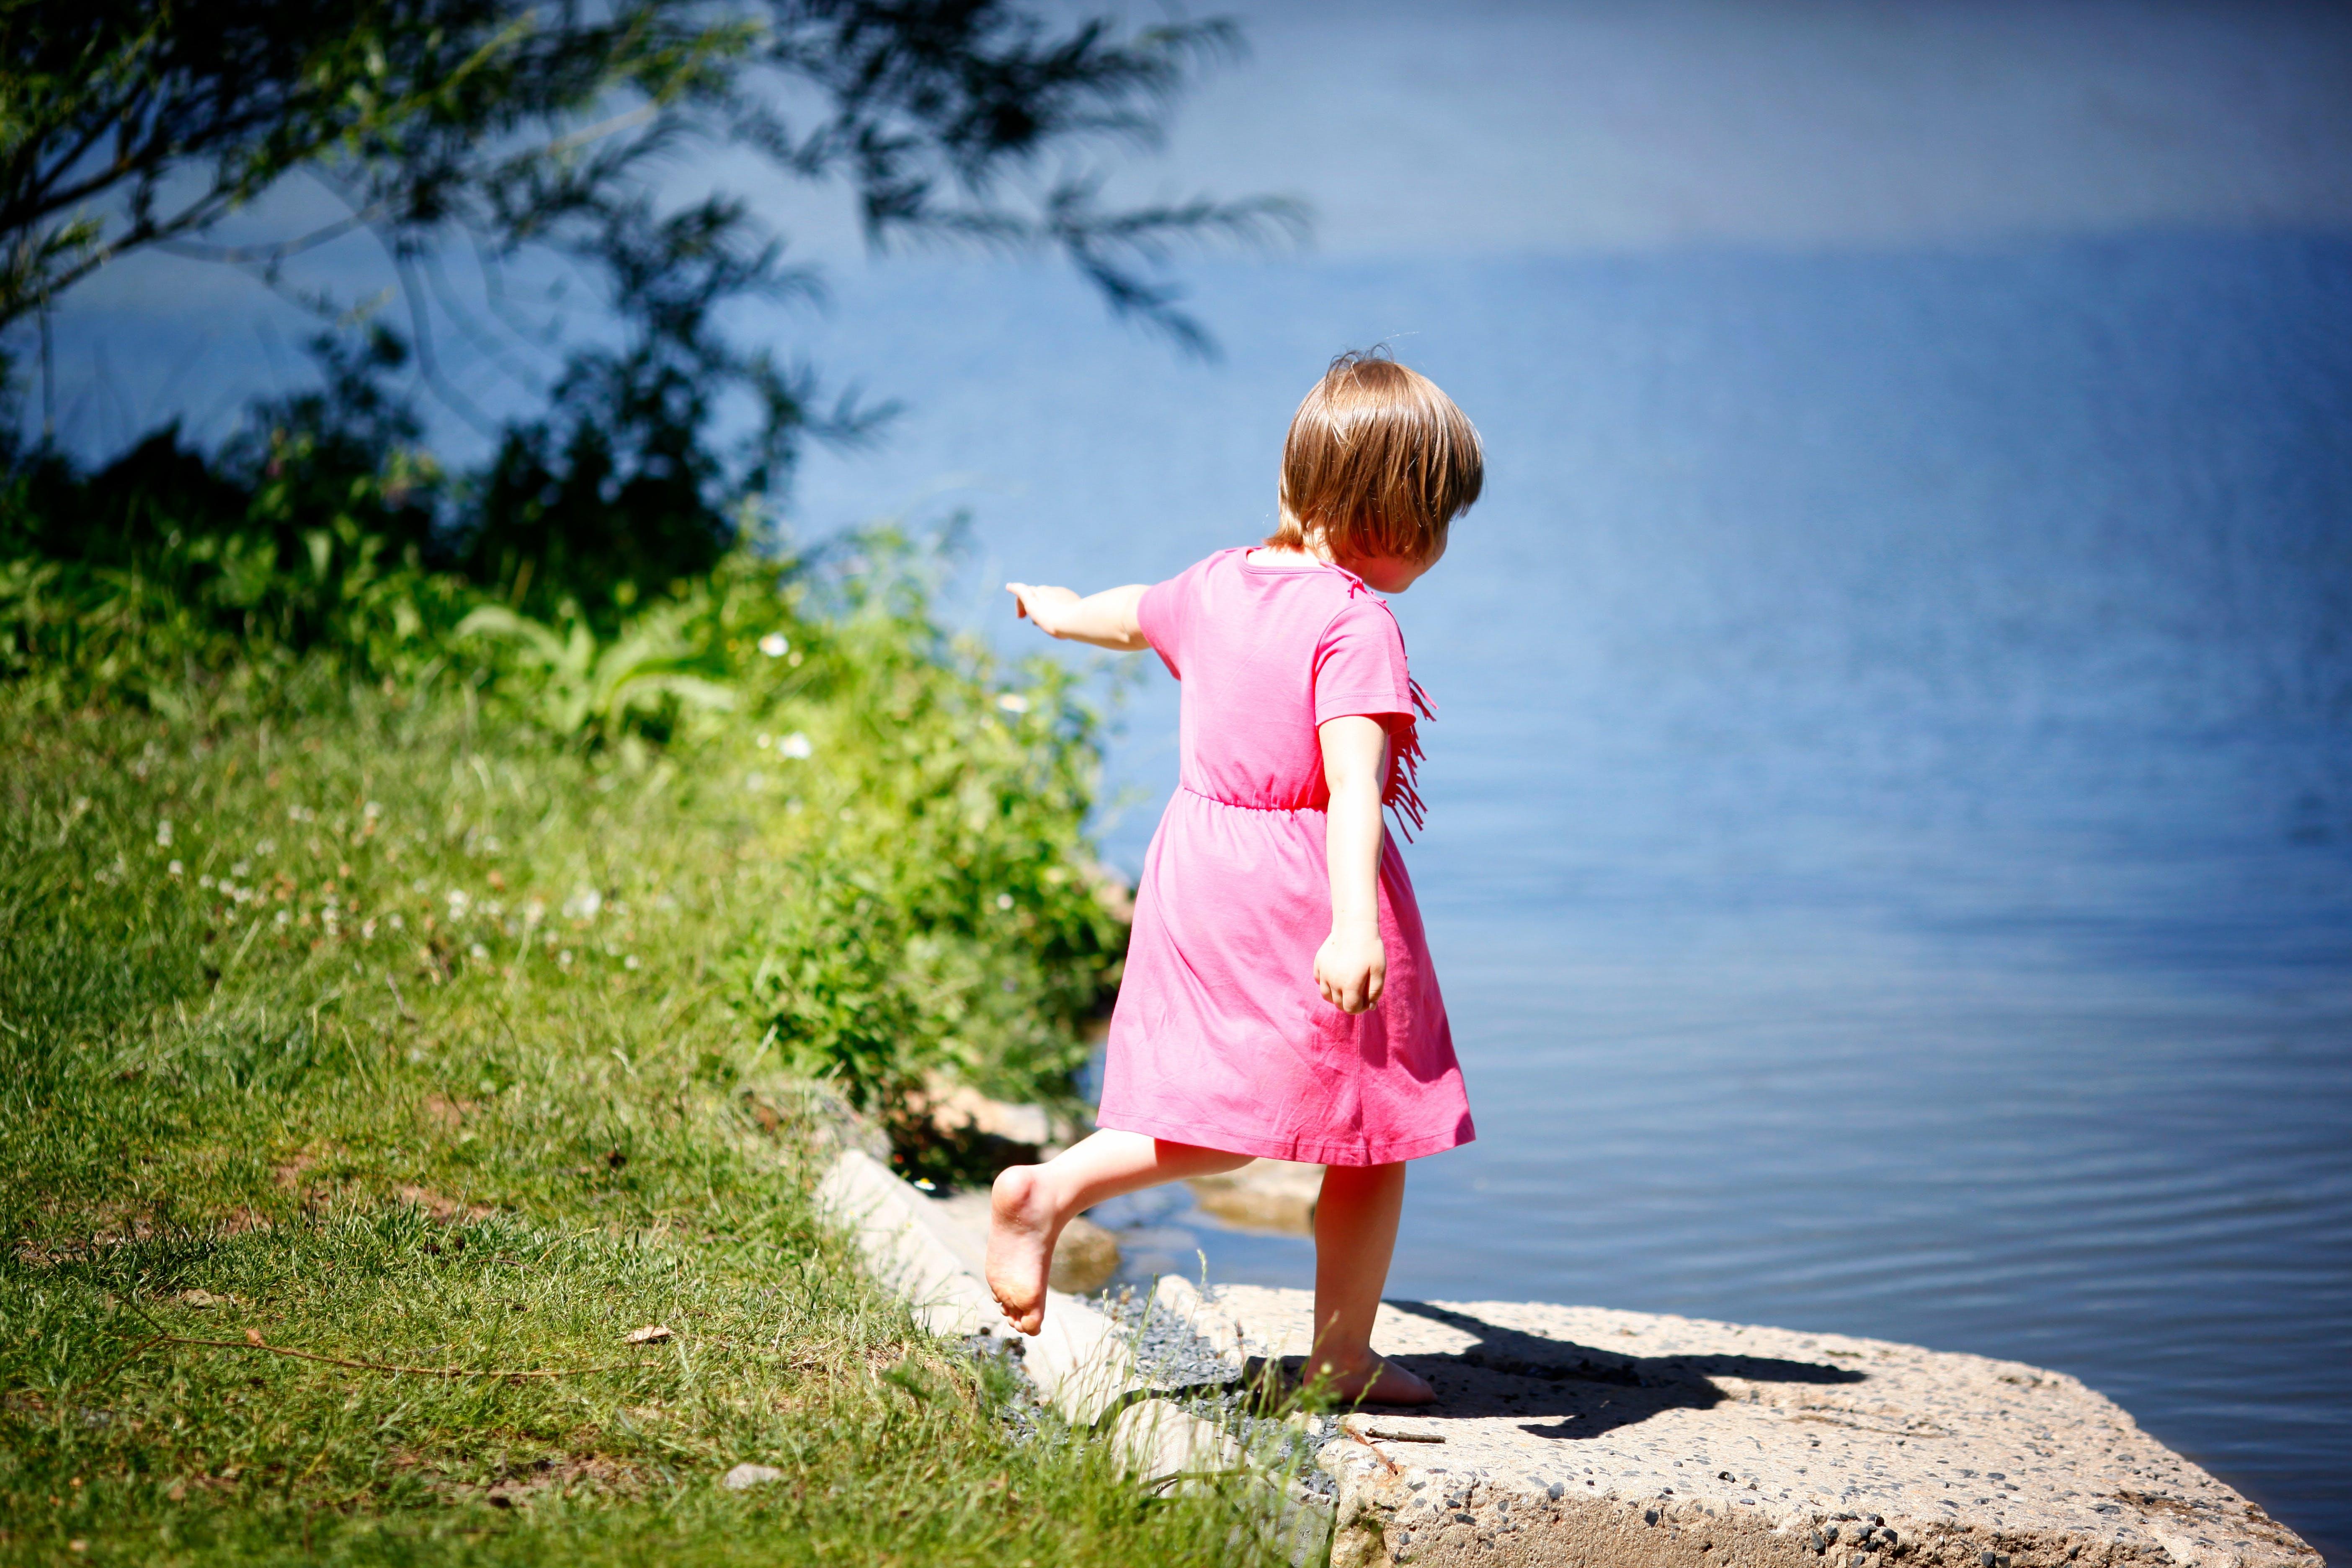 Child Standing Near Body of Water